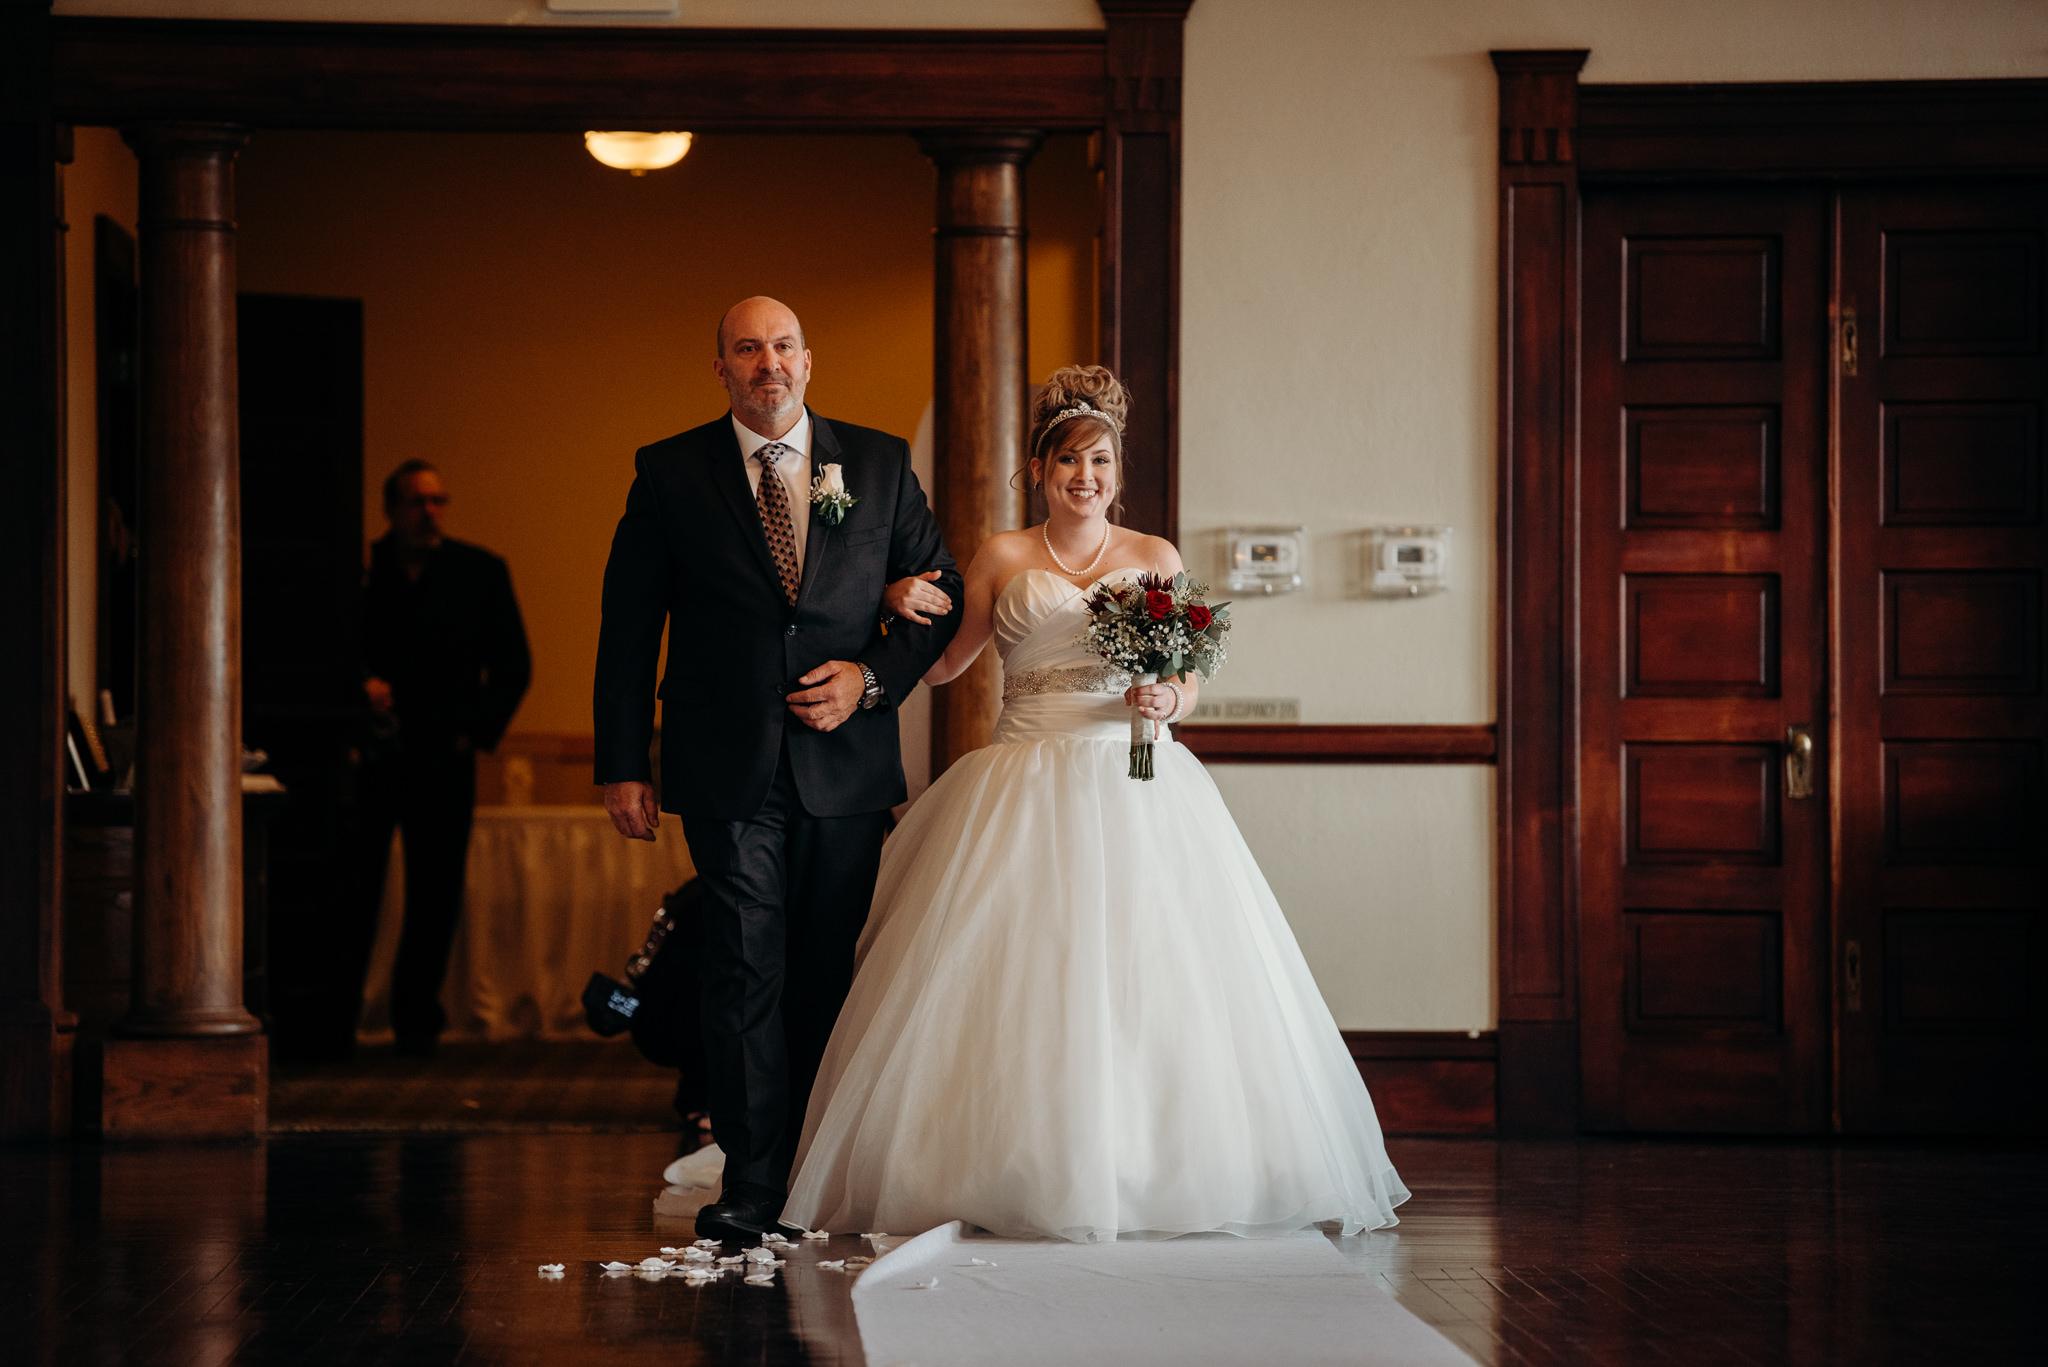 Grant Beachy Photo portrait wedding goshen elkhart south bend chicago-024.jpg